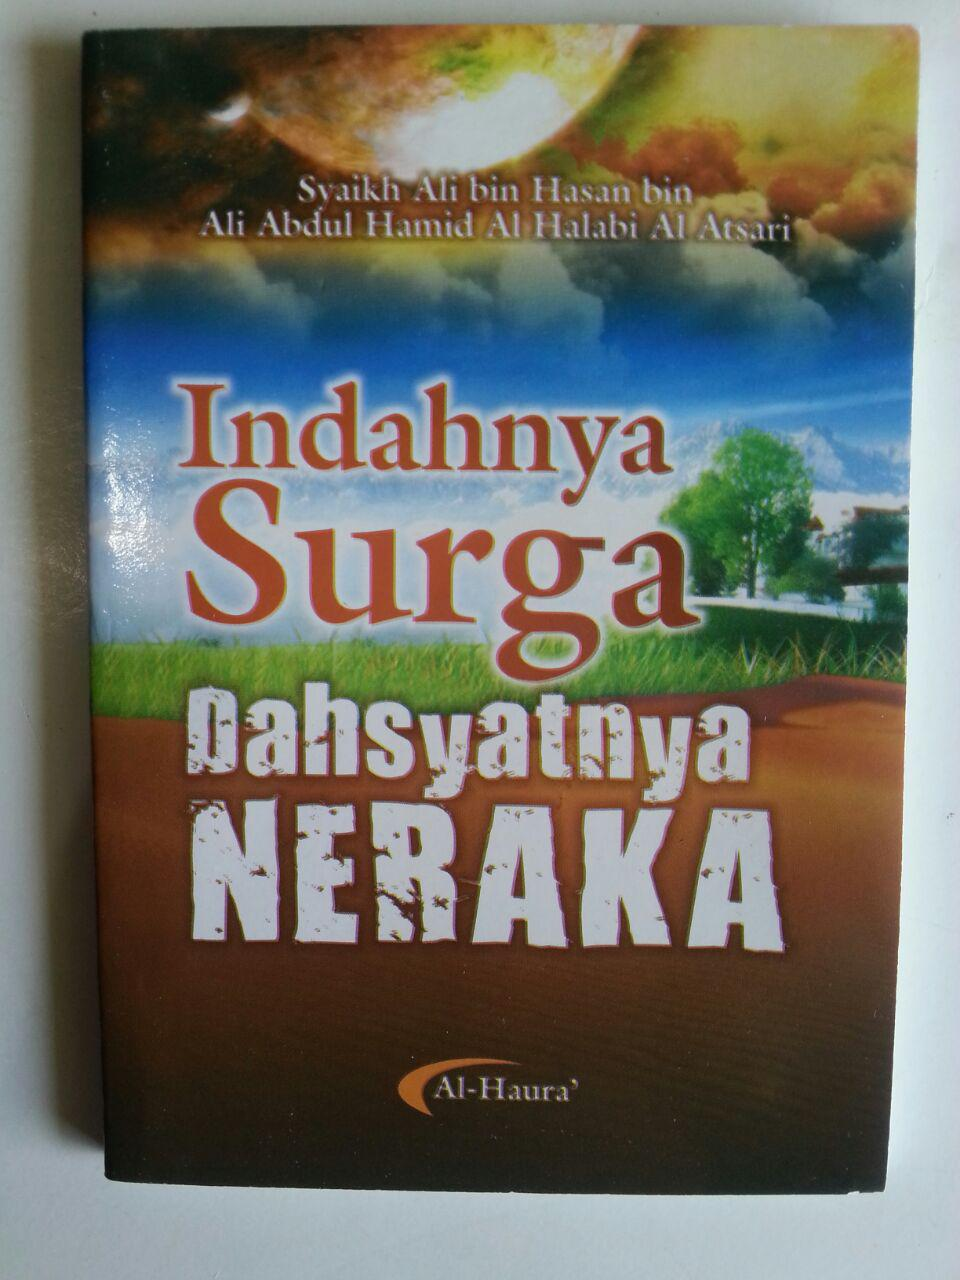 Buku Saku Indahnya Surga Dahsyatnya Neraka cover 2